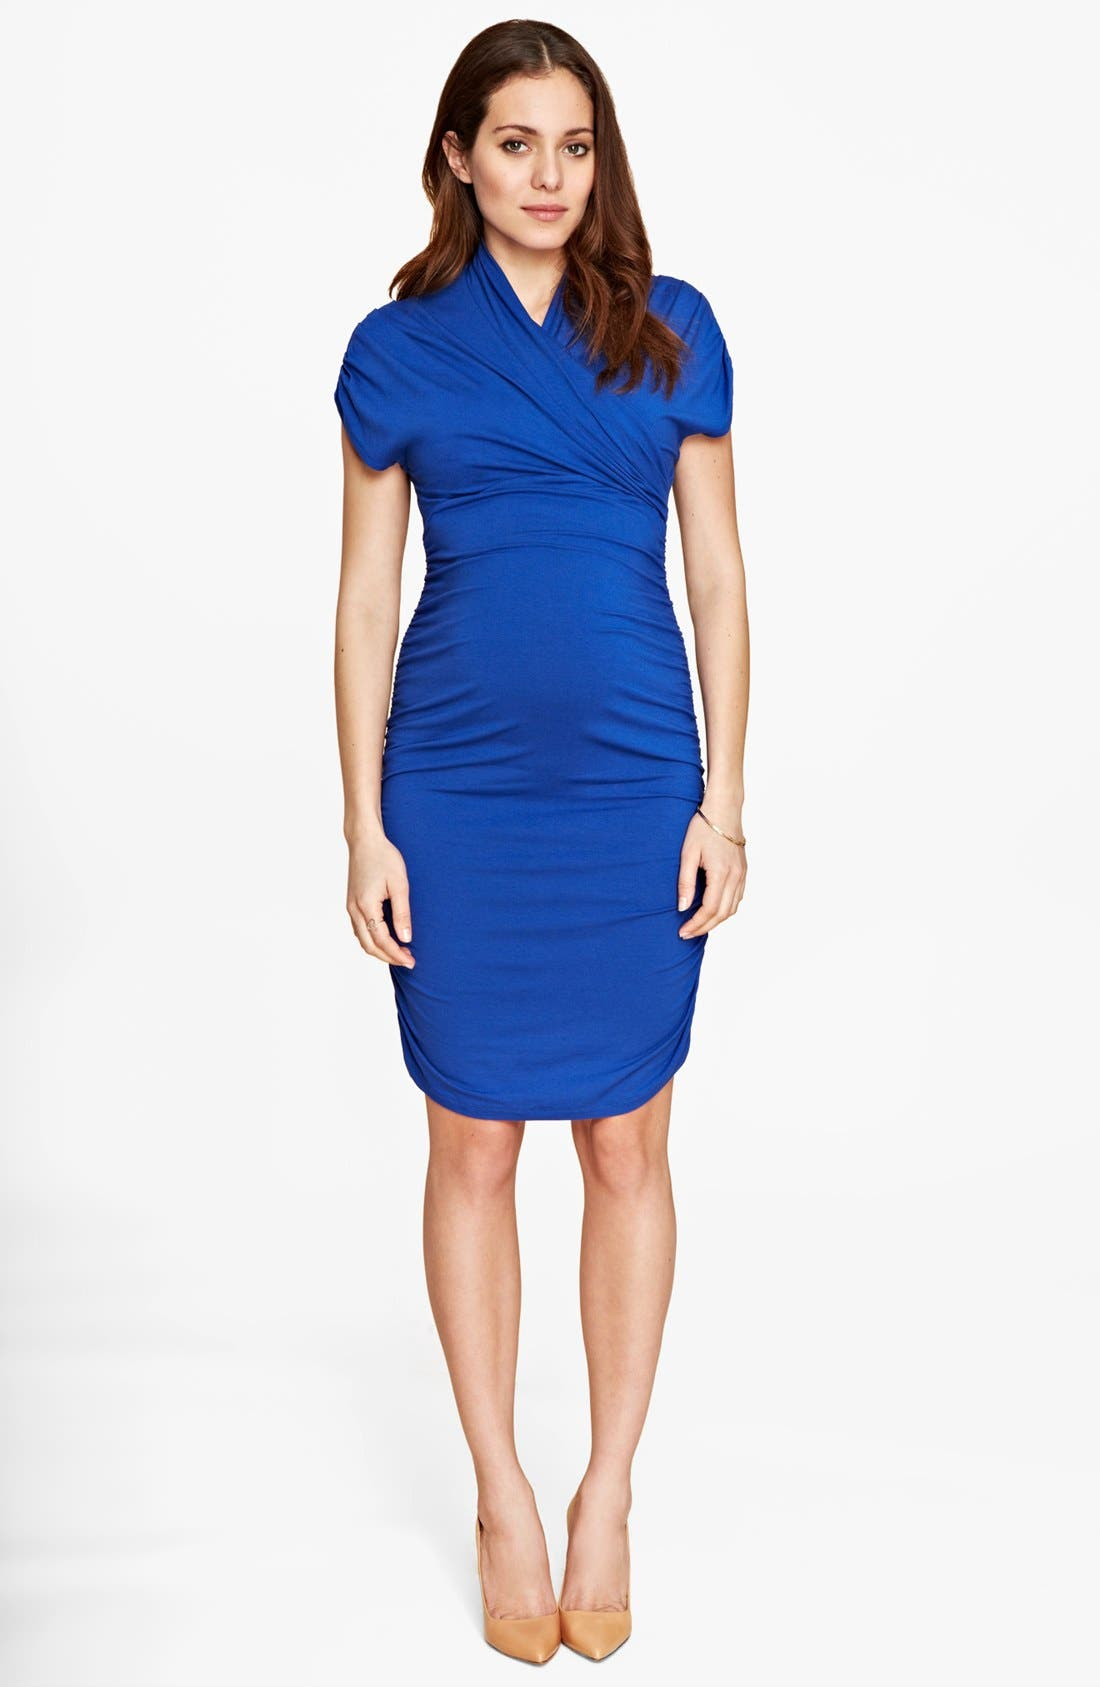 Alternate Image 1 Selected - Isabella Oliver 'Grace' Ruched Maternity Dress